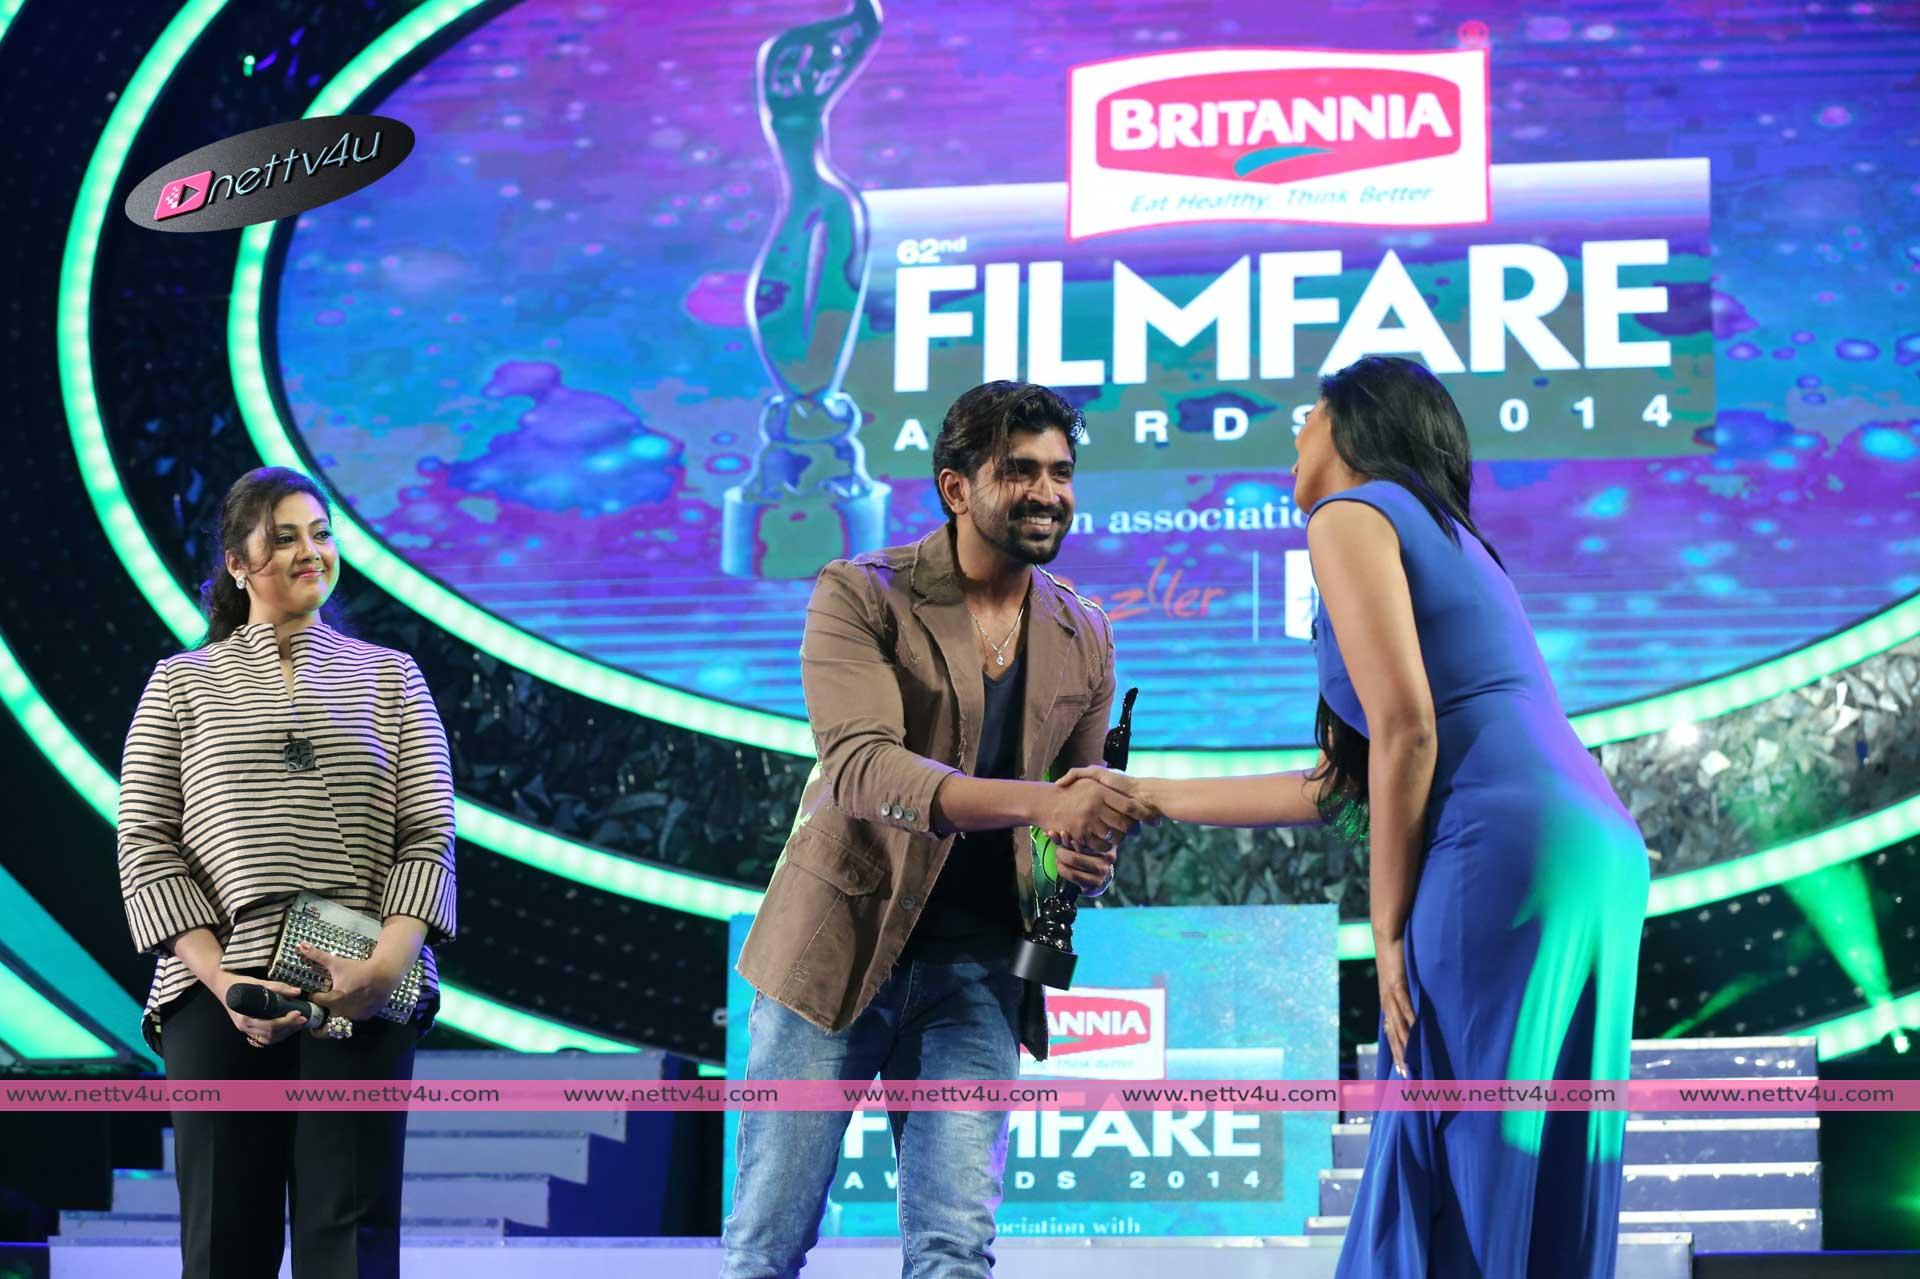 Britannia Filmfare Awards 2014 Photoshoot